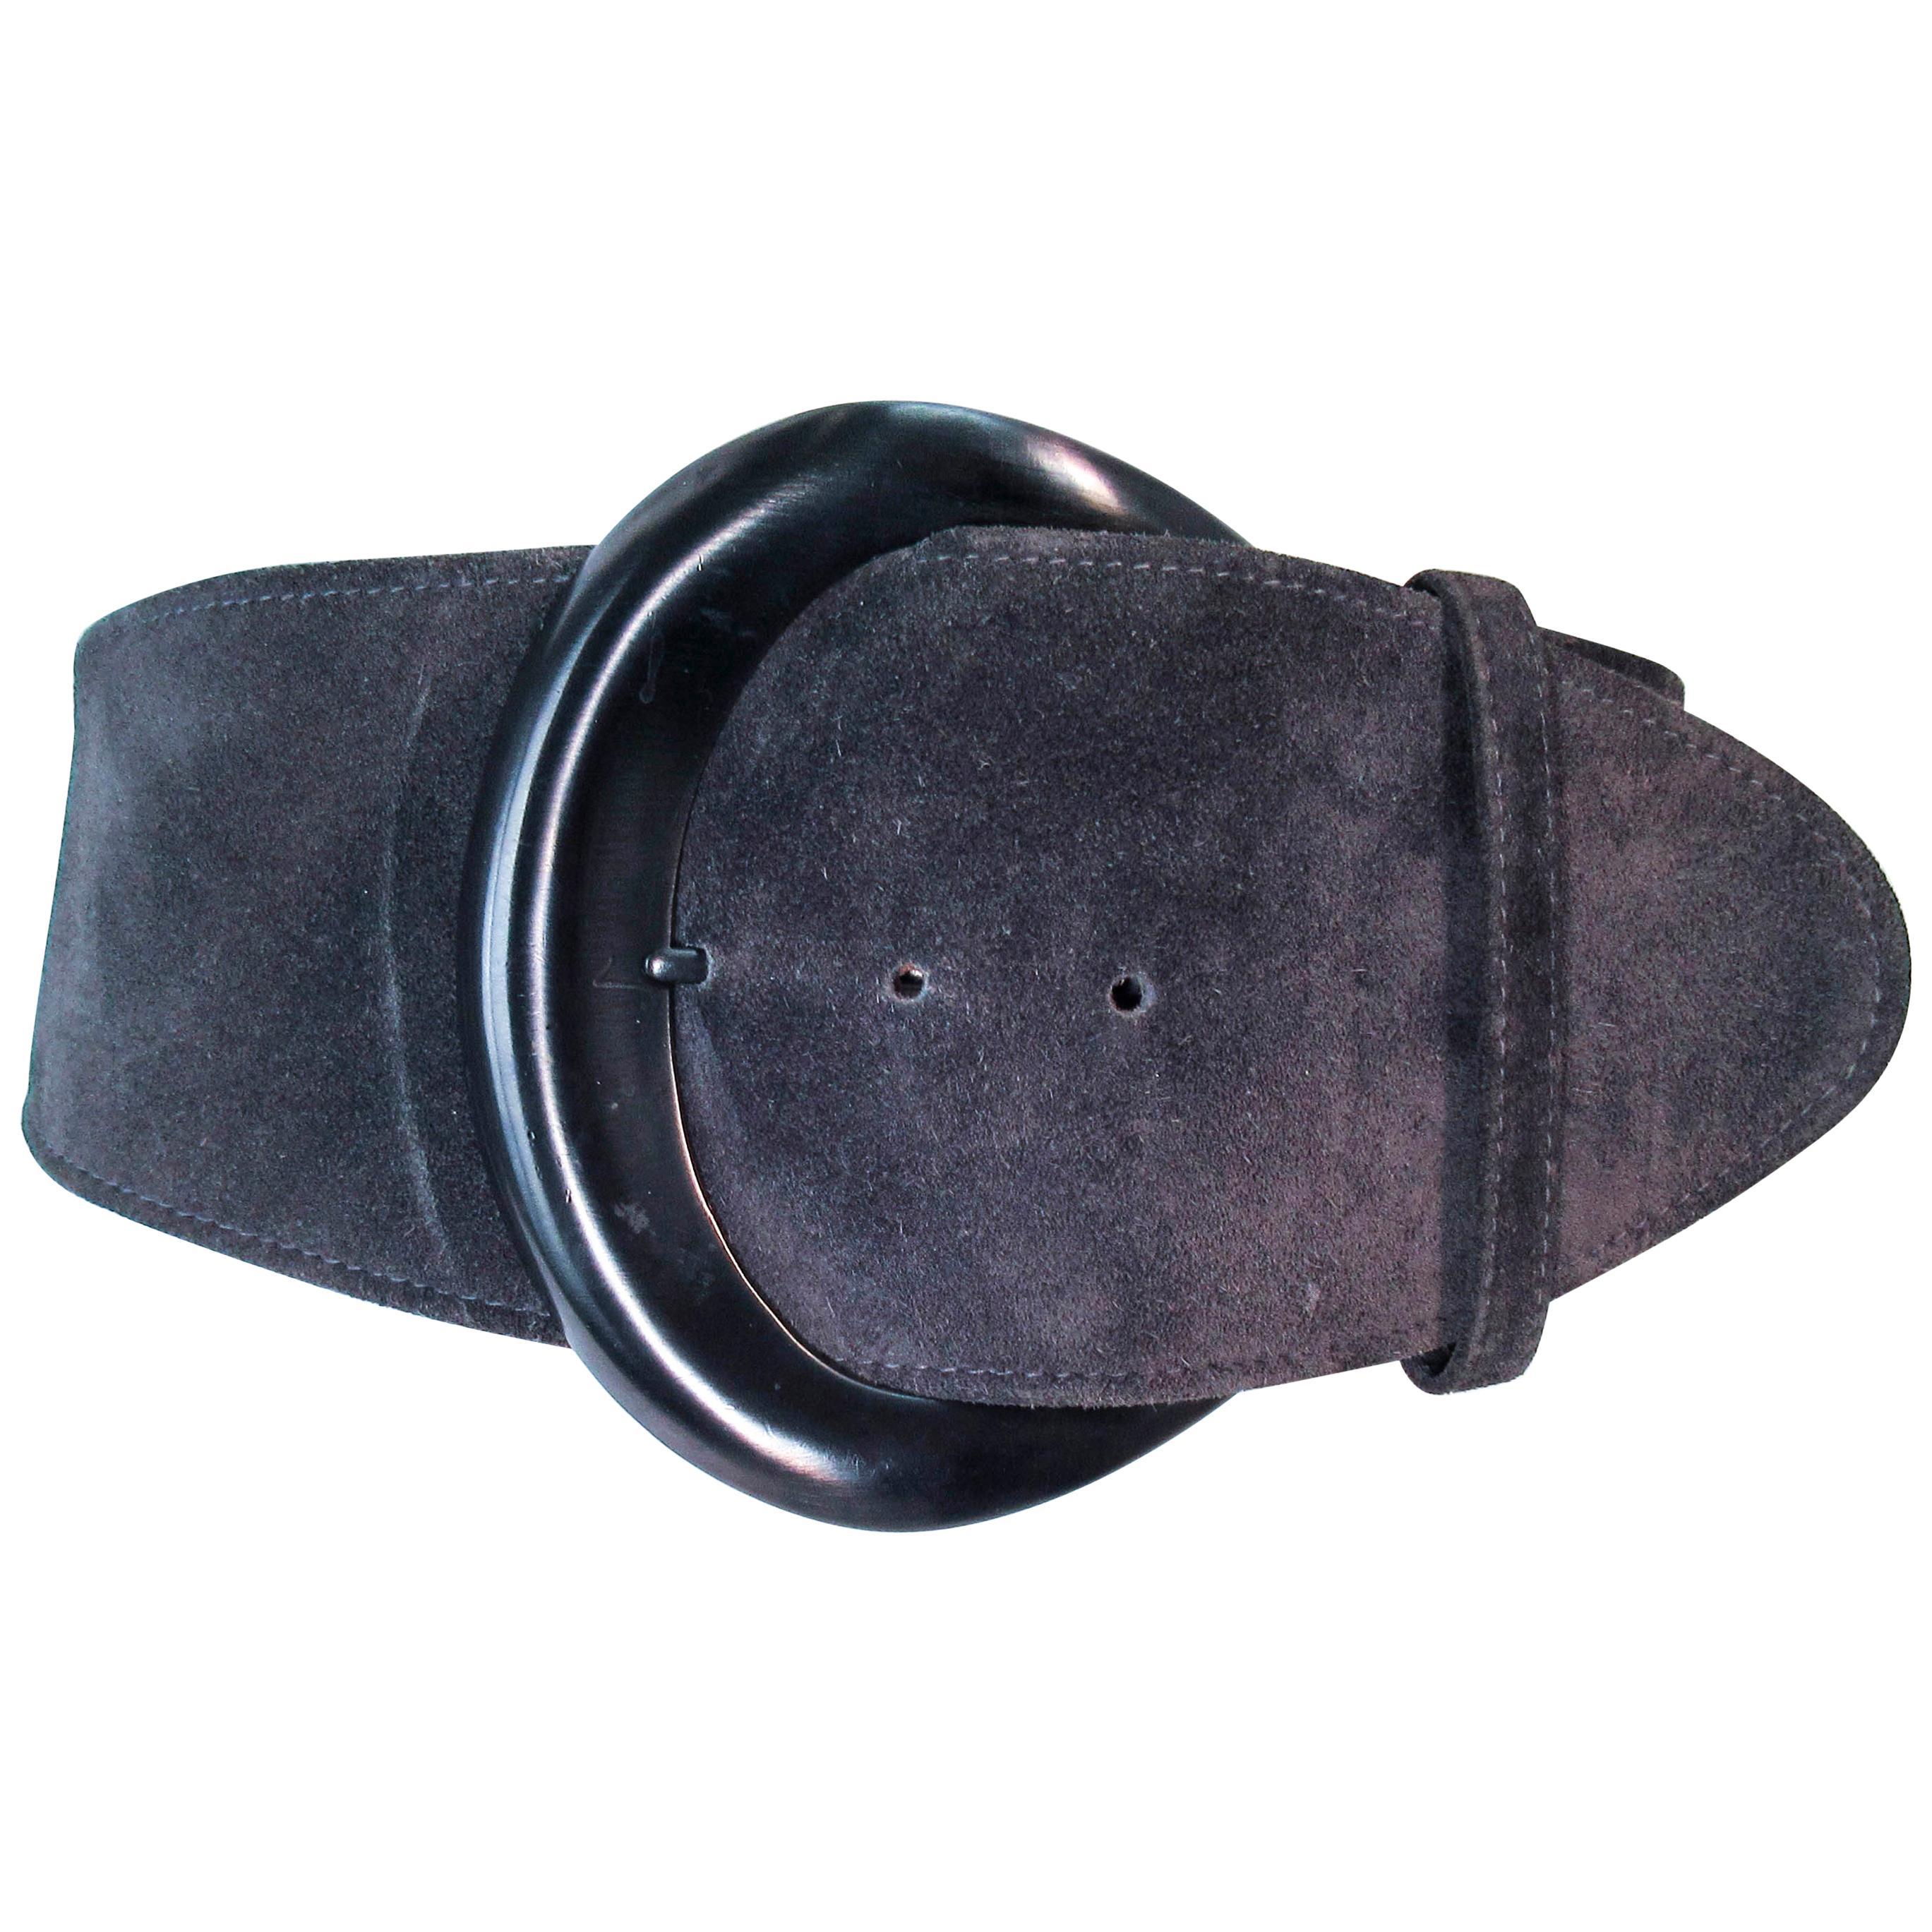 DONNA KARAN Grey Wide Suede Belt with Gunmetal Tone Buckle Size XS